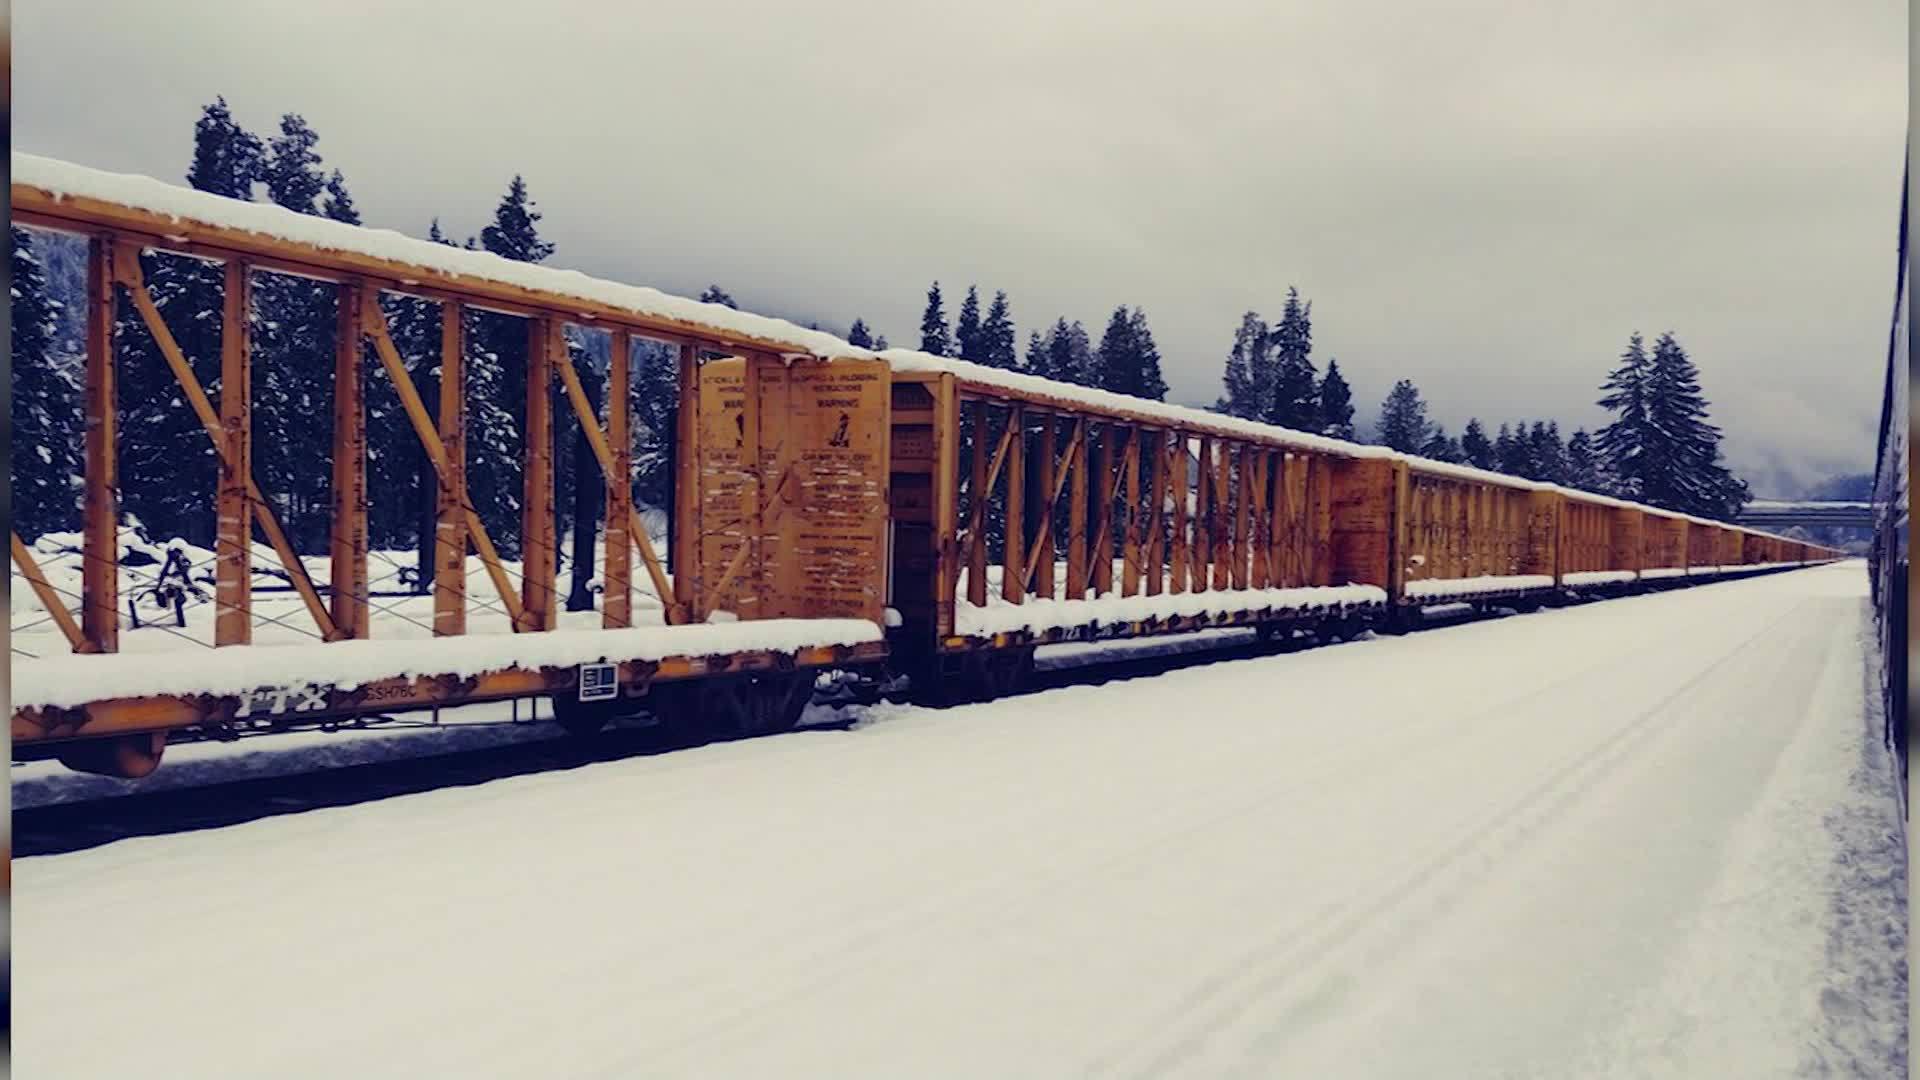 Oregon Train Stranded in the Snow